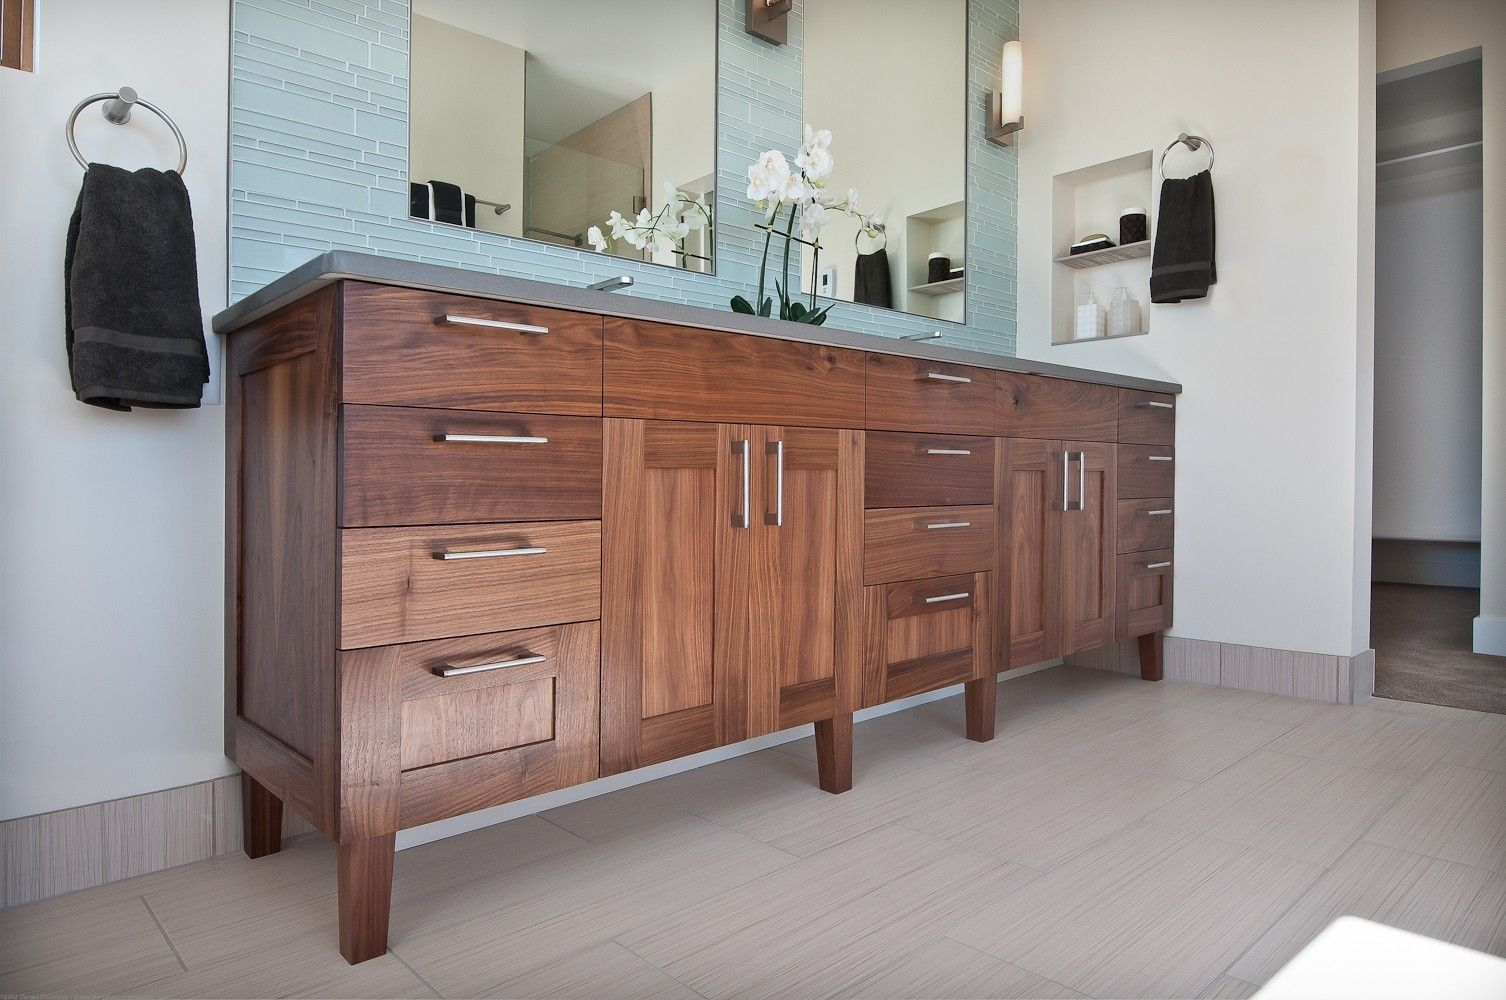 Hand Made Bathroom Vanity by Marc Hunter Woodworking | Design ...